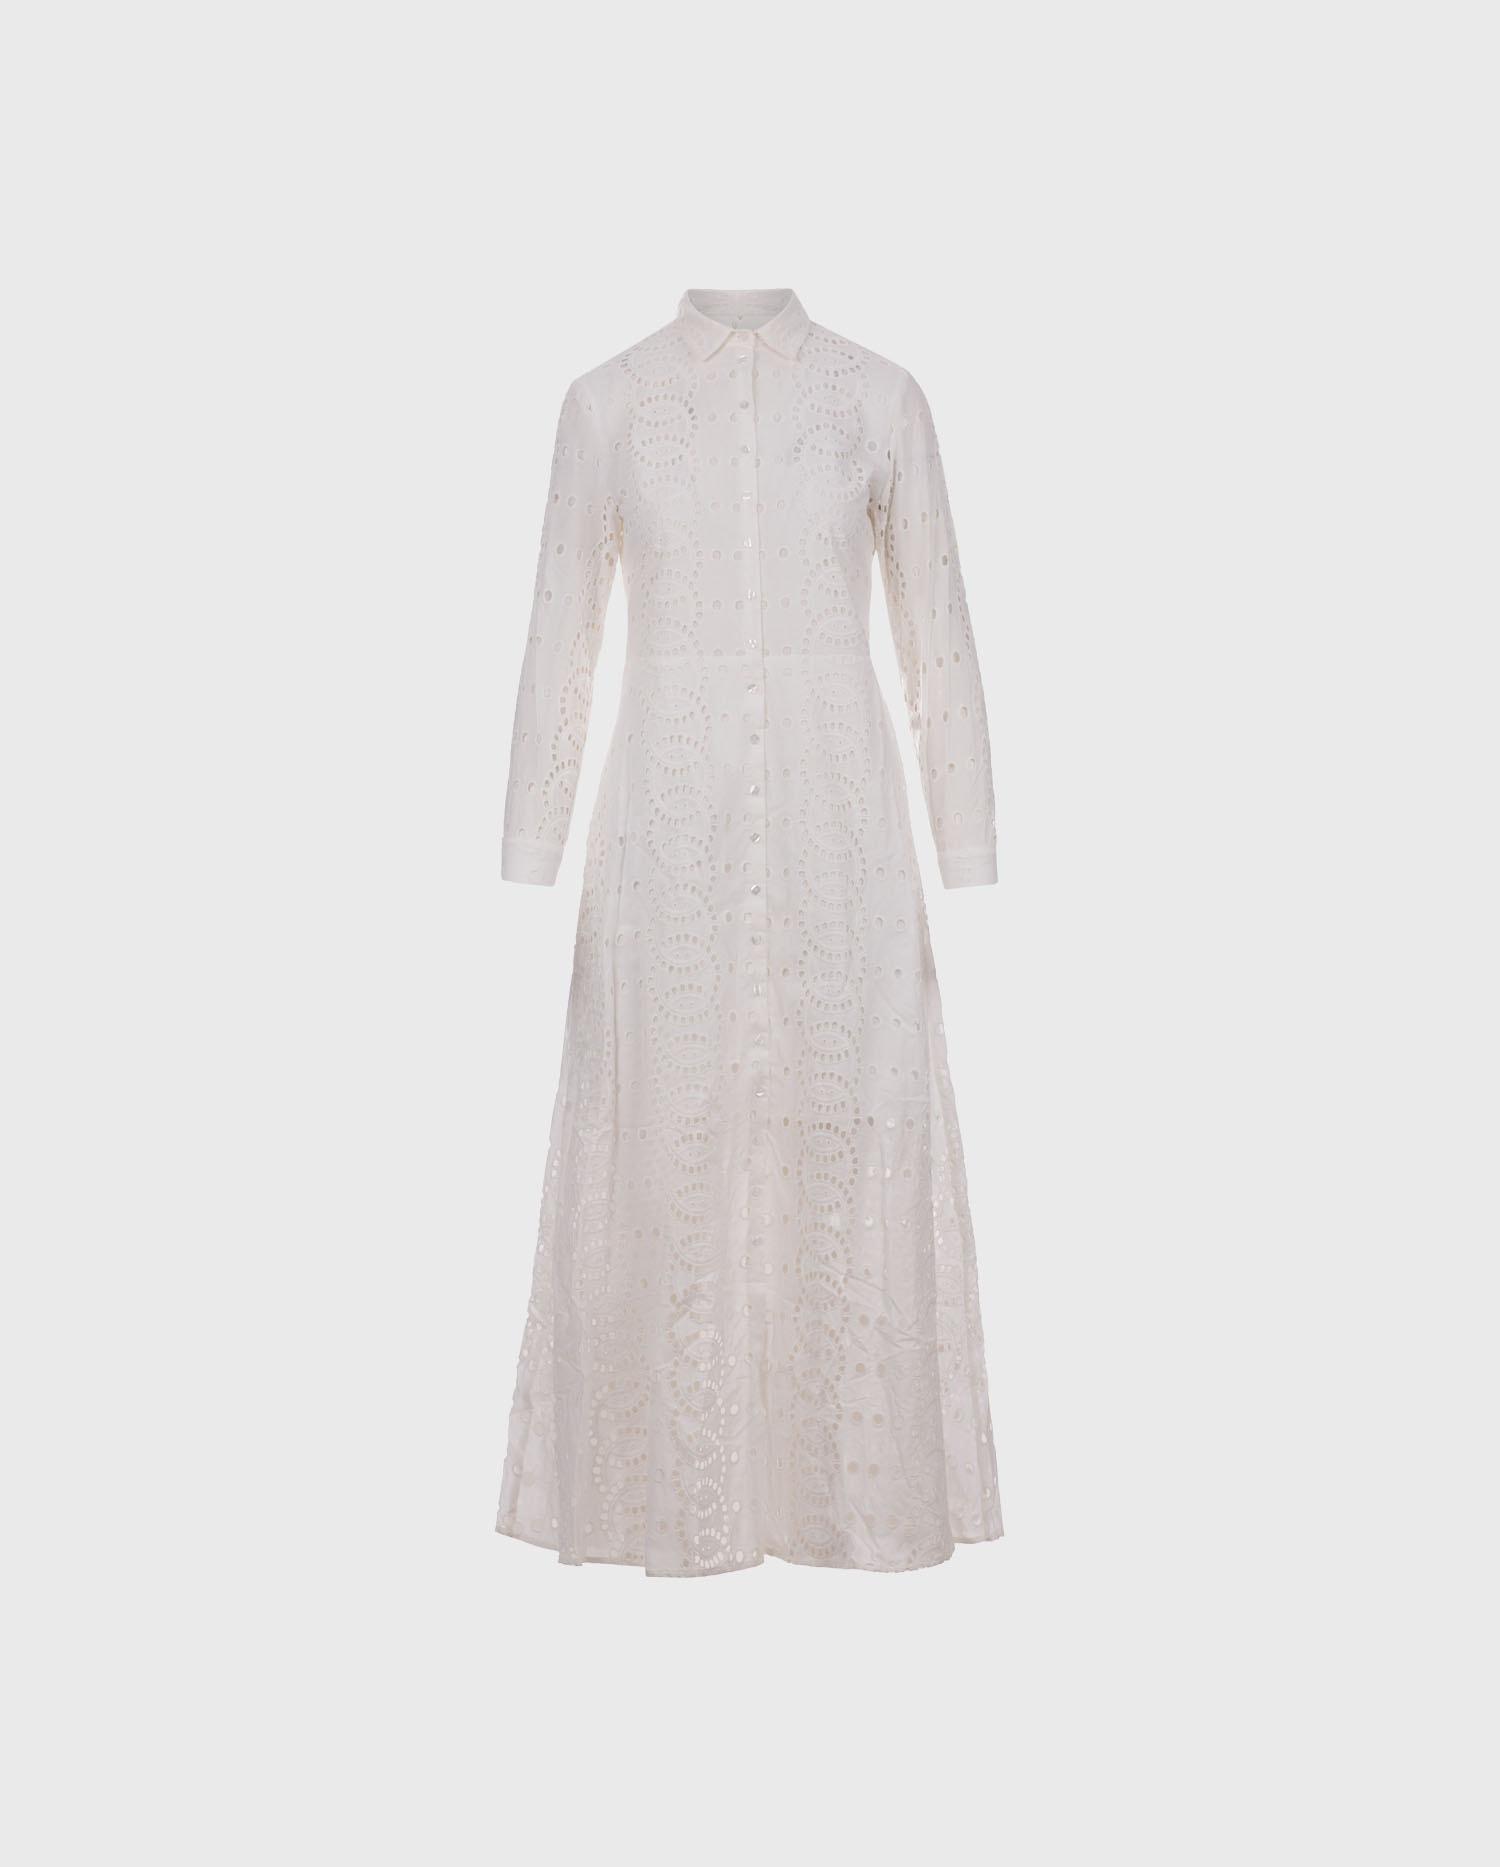 The Cascais white eyelet embroidery maxi dress to add your wardrobe.